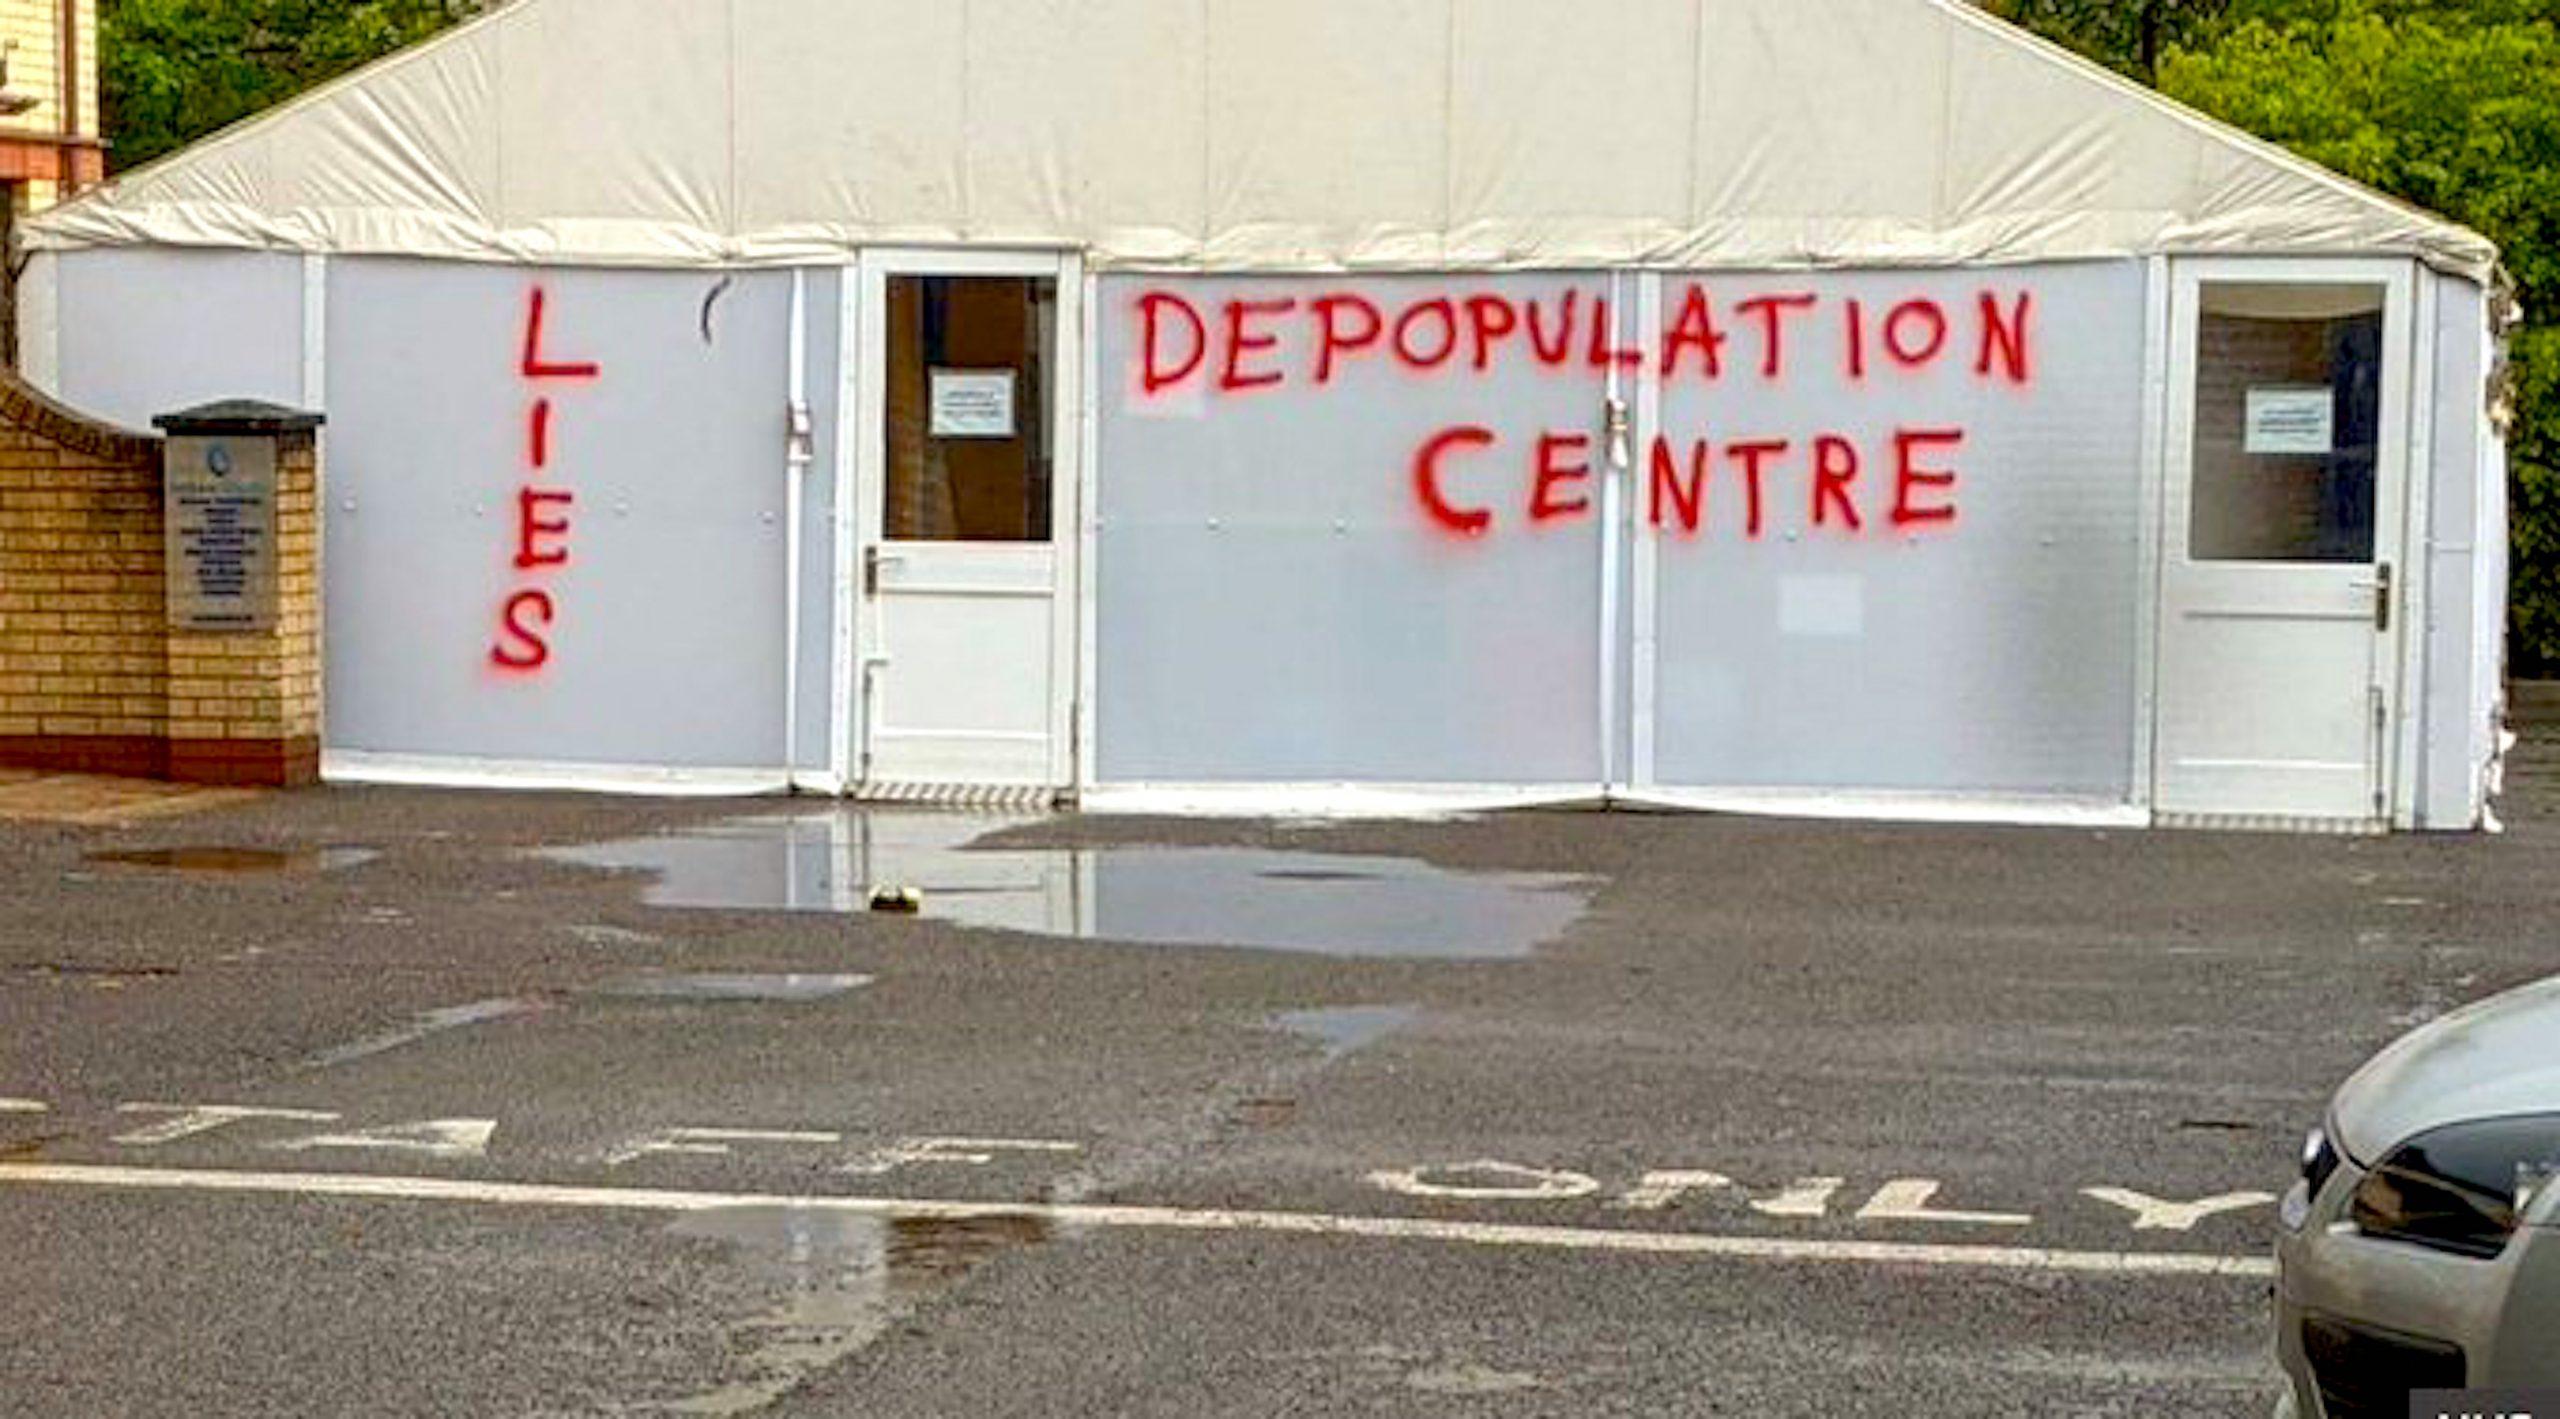 Depopulation Center (foto Twitter)